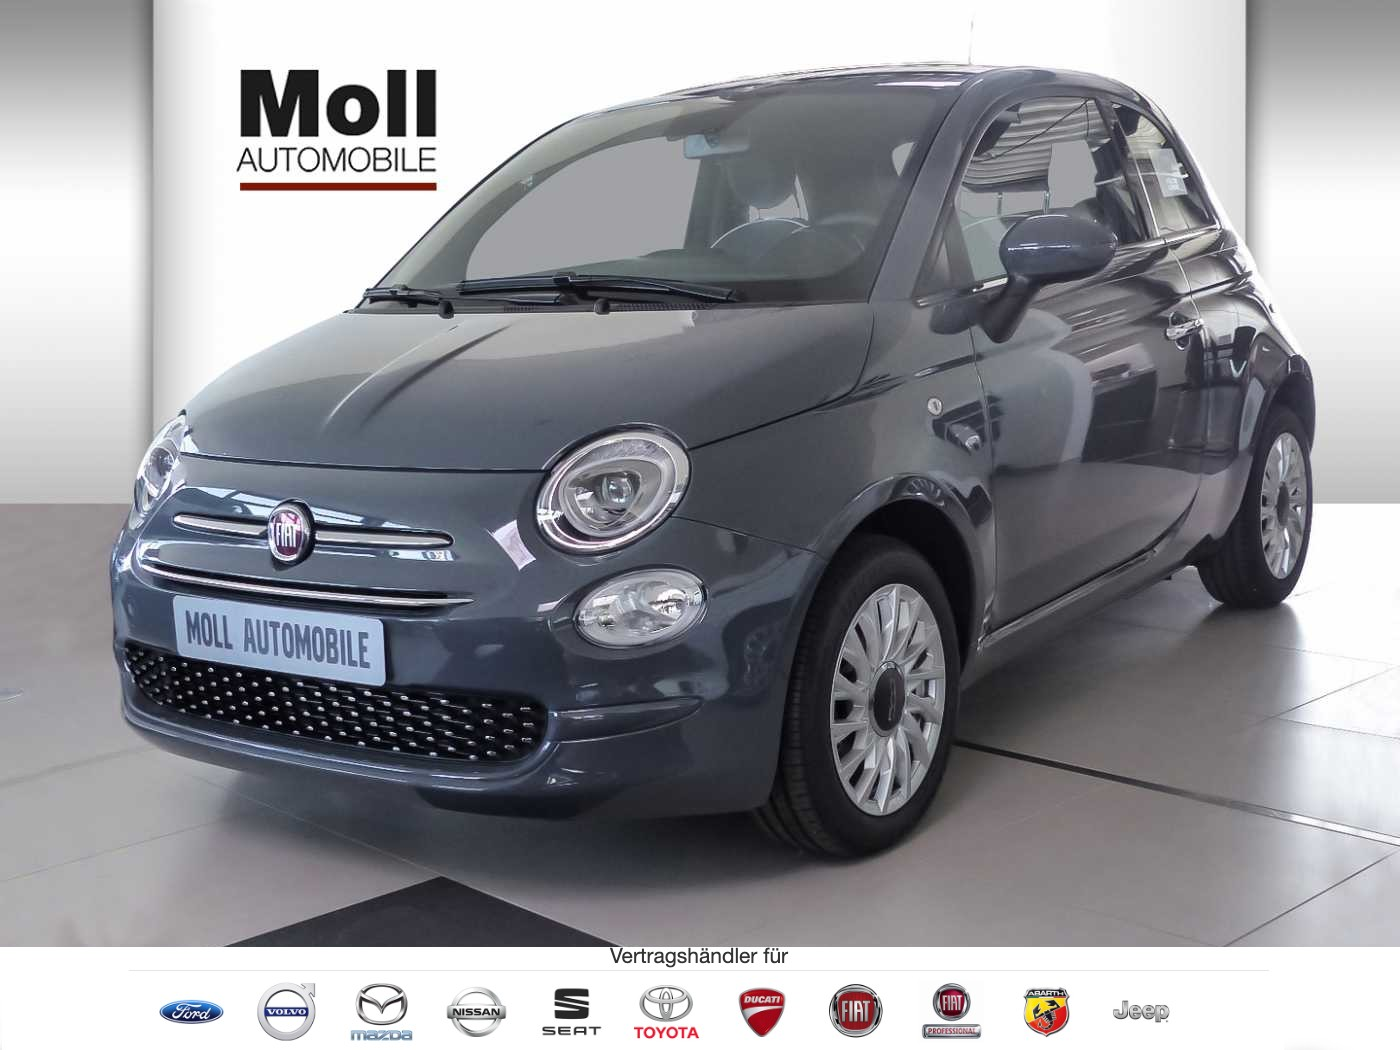 Fiat 500 Serie 7 Lounge PDC, Klima, 7' Radio, Alu, Apple CarPlay, Jahr 2018, Benzin